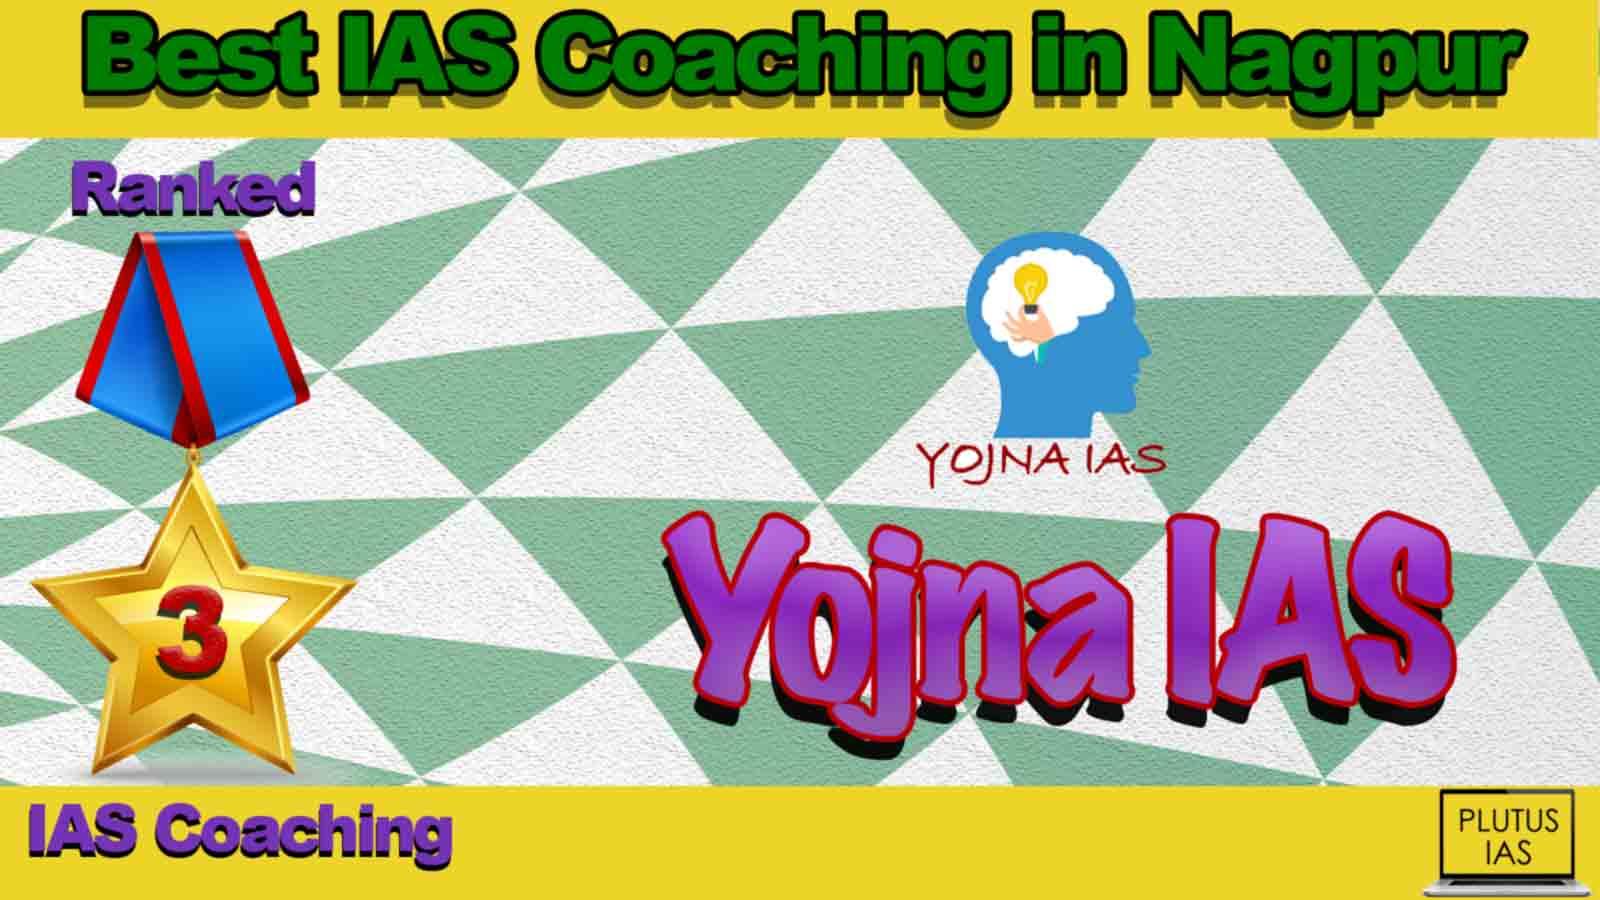 Top IAS Coaching in Nagpur